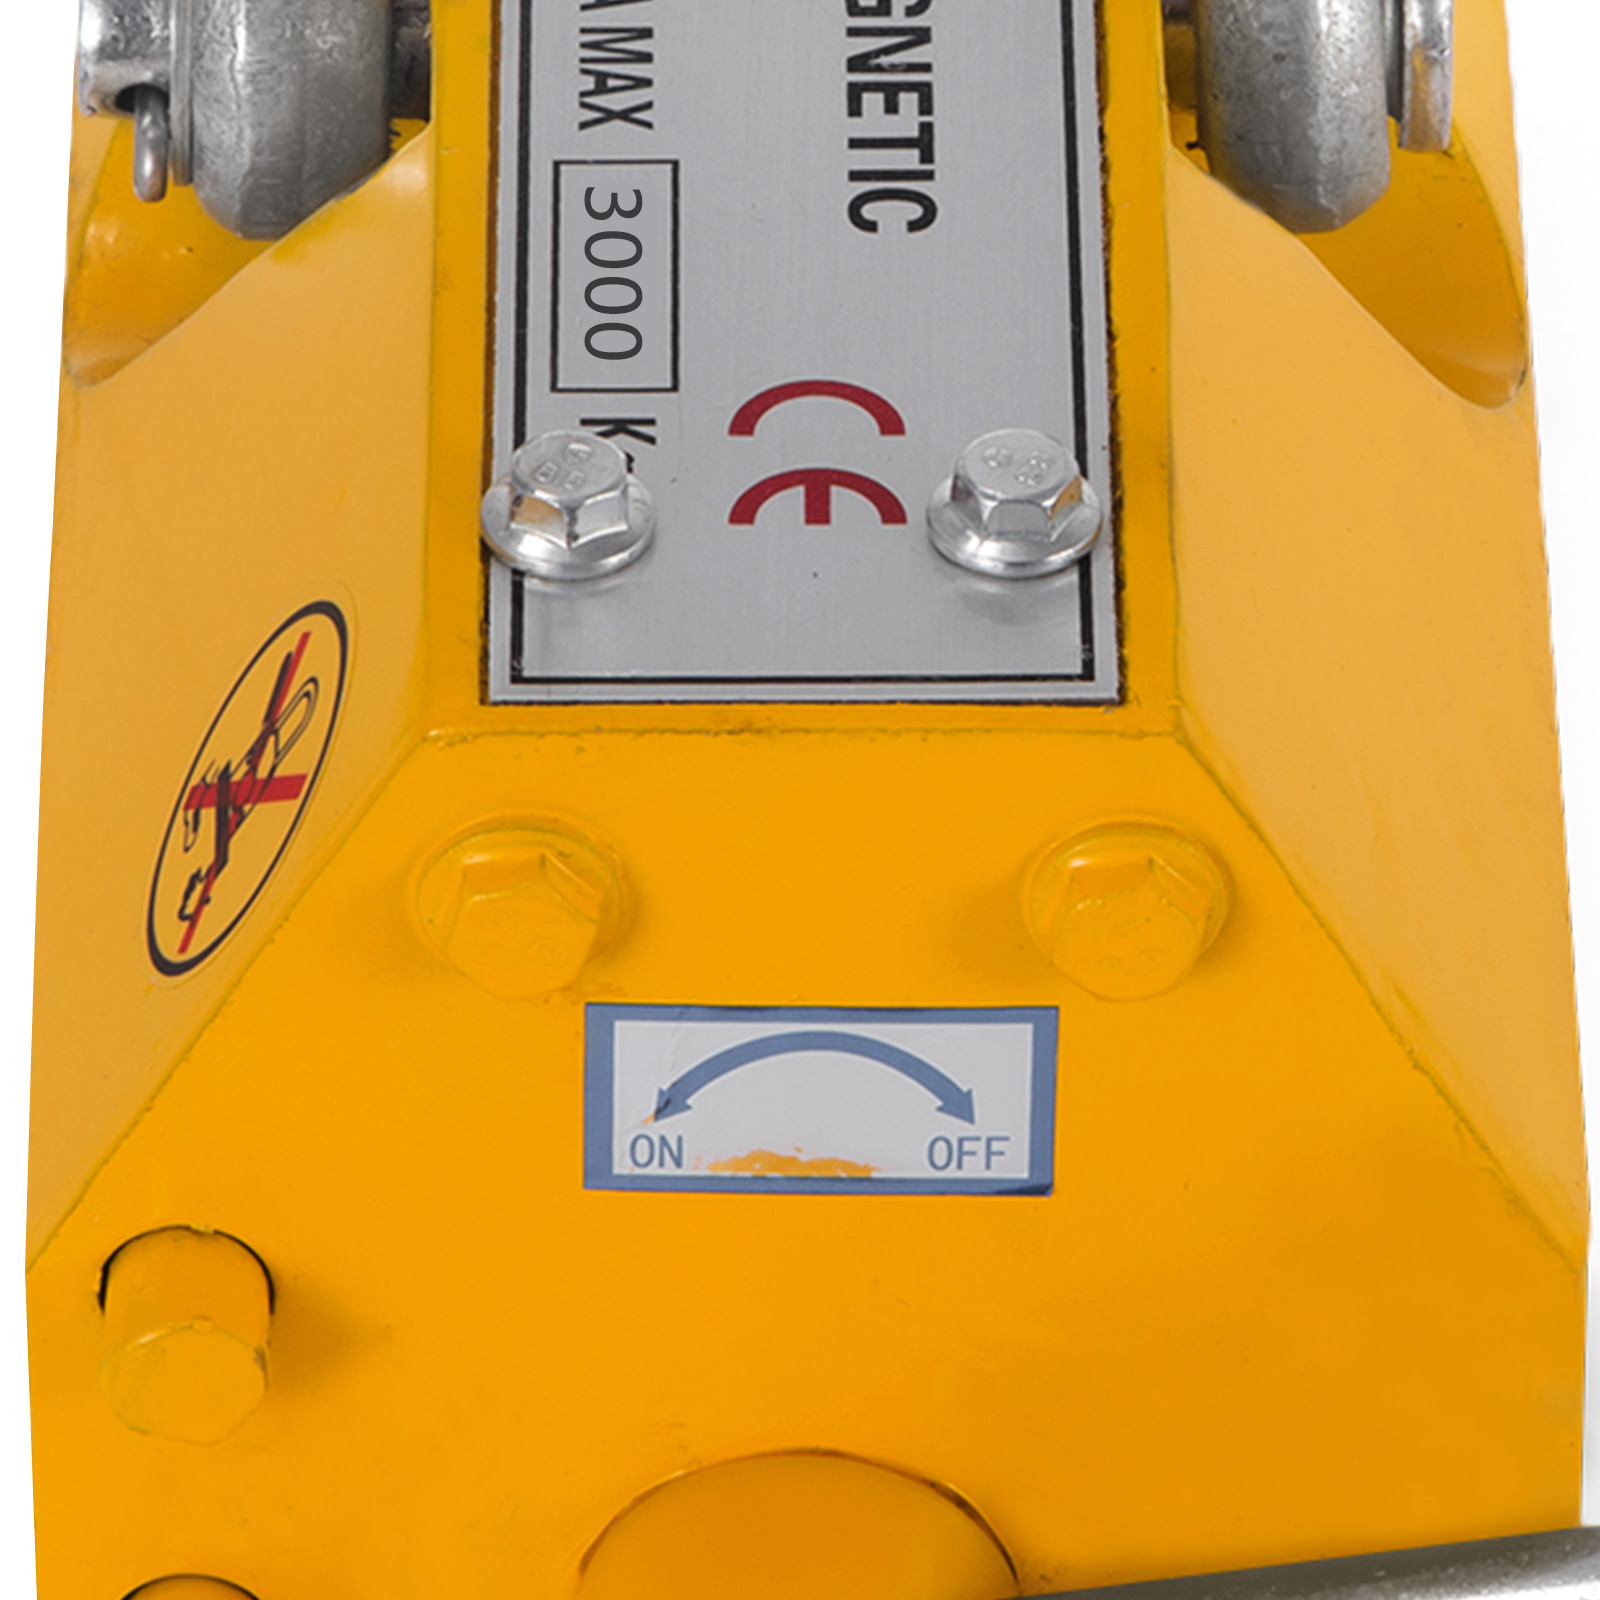 100-300-600-1000KG-Steel-Magnetic-Lifter-Heavy-Duty-Crane-Hoist-Lifting-Magnet miniature 105